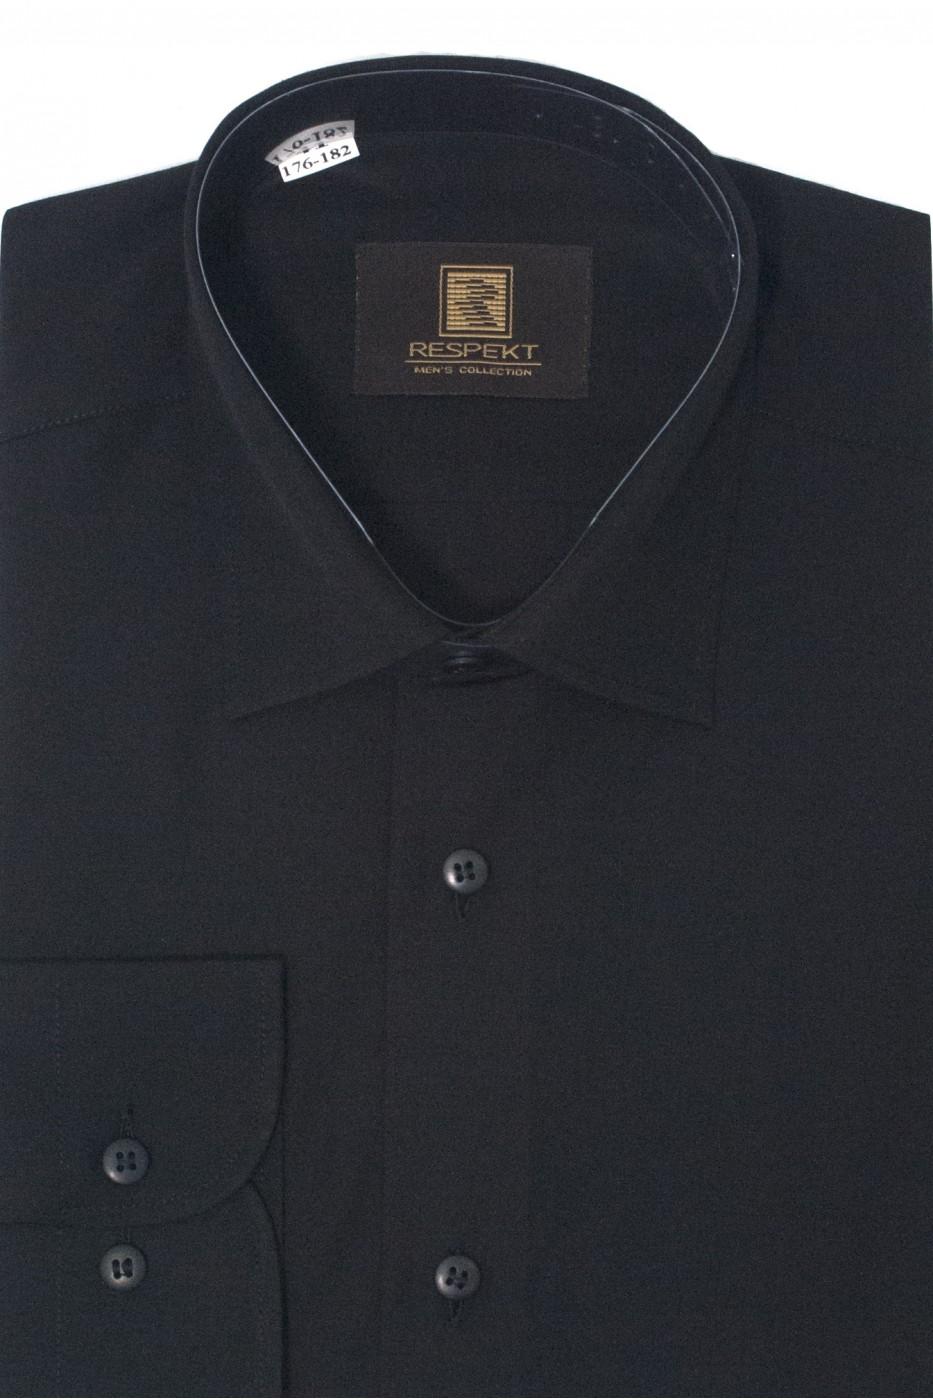 Чёрная мужская однотонная рубашка 310 (54-07)